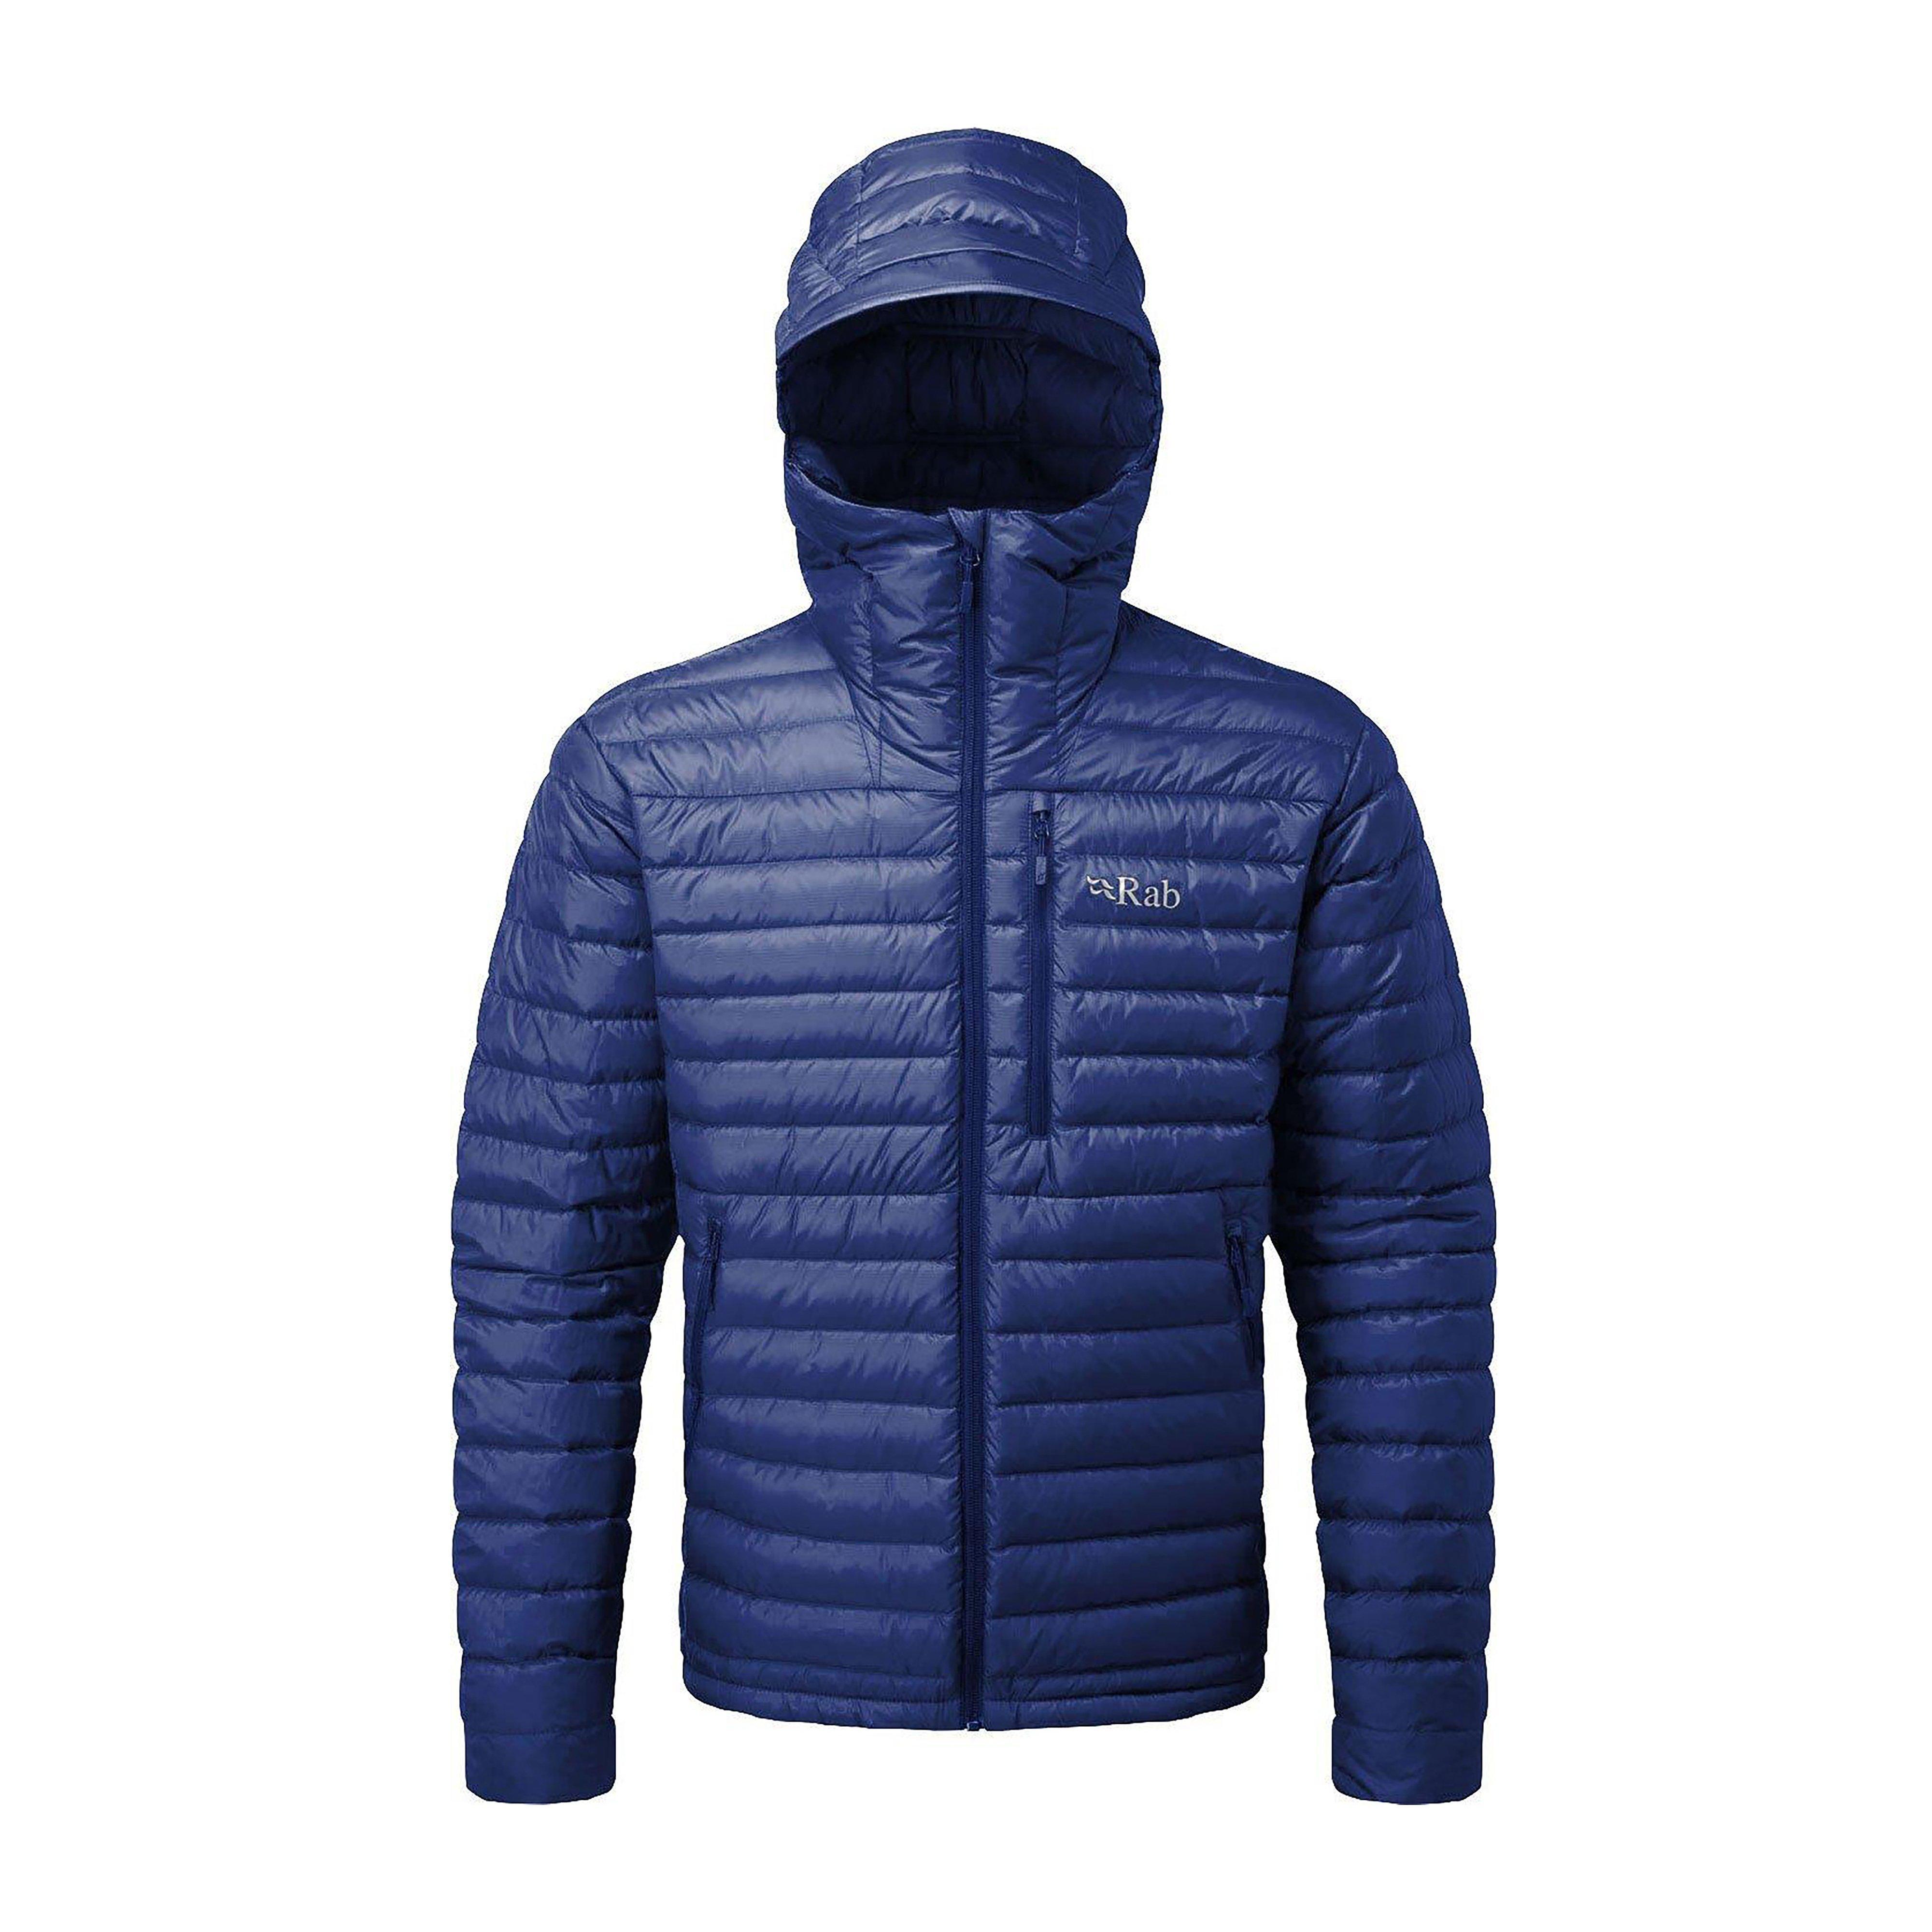 Rab Rab Microlight Alpine Mens Down Jacket - N/A, N/A